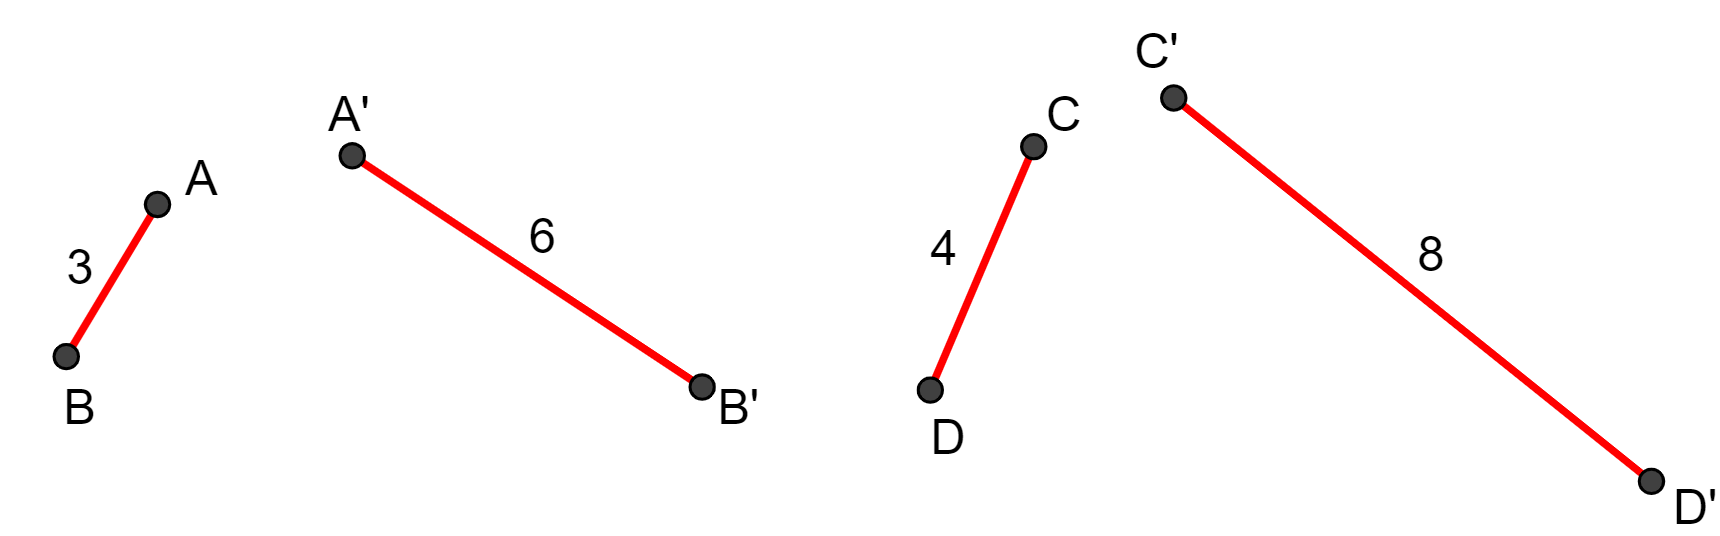 Pares de segmentos proporcionais - teorema de Tales